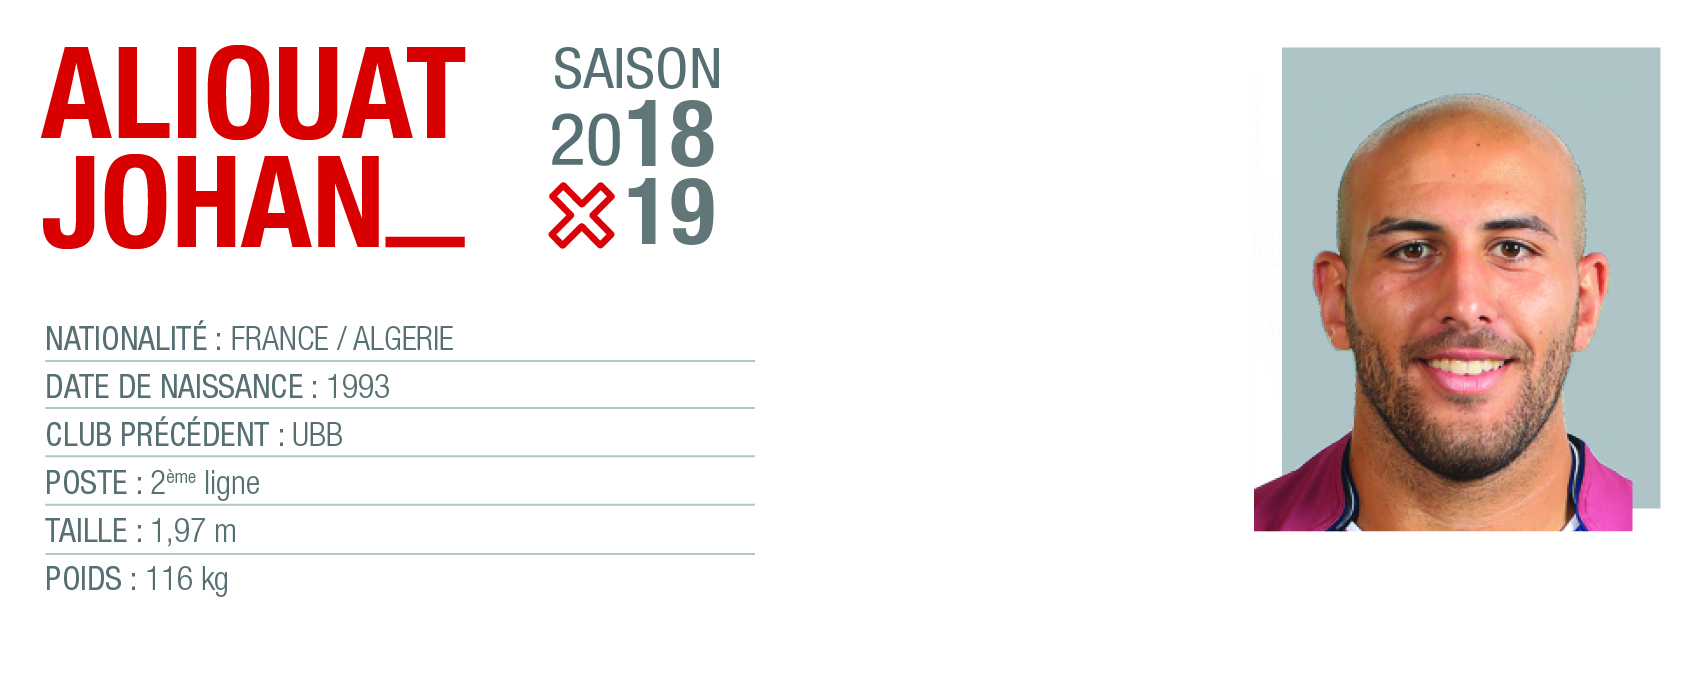 SAISON 2018 - 2019 - Page 2 5b2392bfbbddbd5e60218714